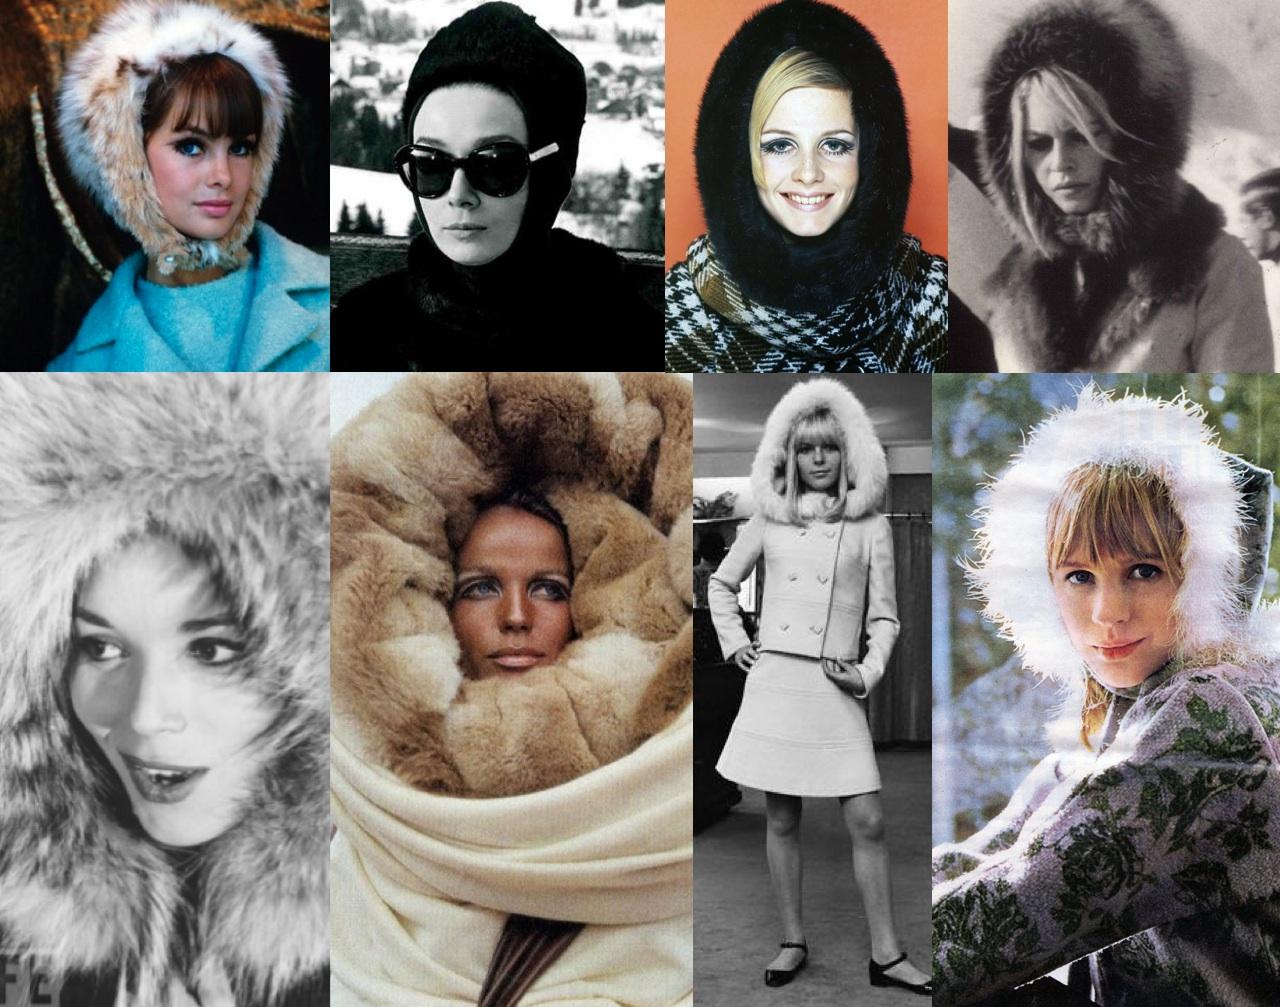 http://4.bp.blogspot.com/-JkQTVTl9-4M/URGTJtdoL5I/AAAAAAAAEbM/eNQzKkKl_cA/s1600/Fur+Hood_DRG+girls.jpg